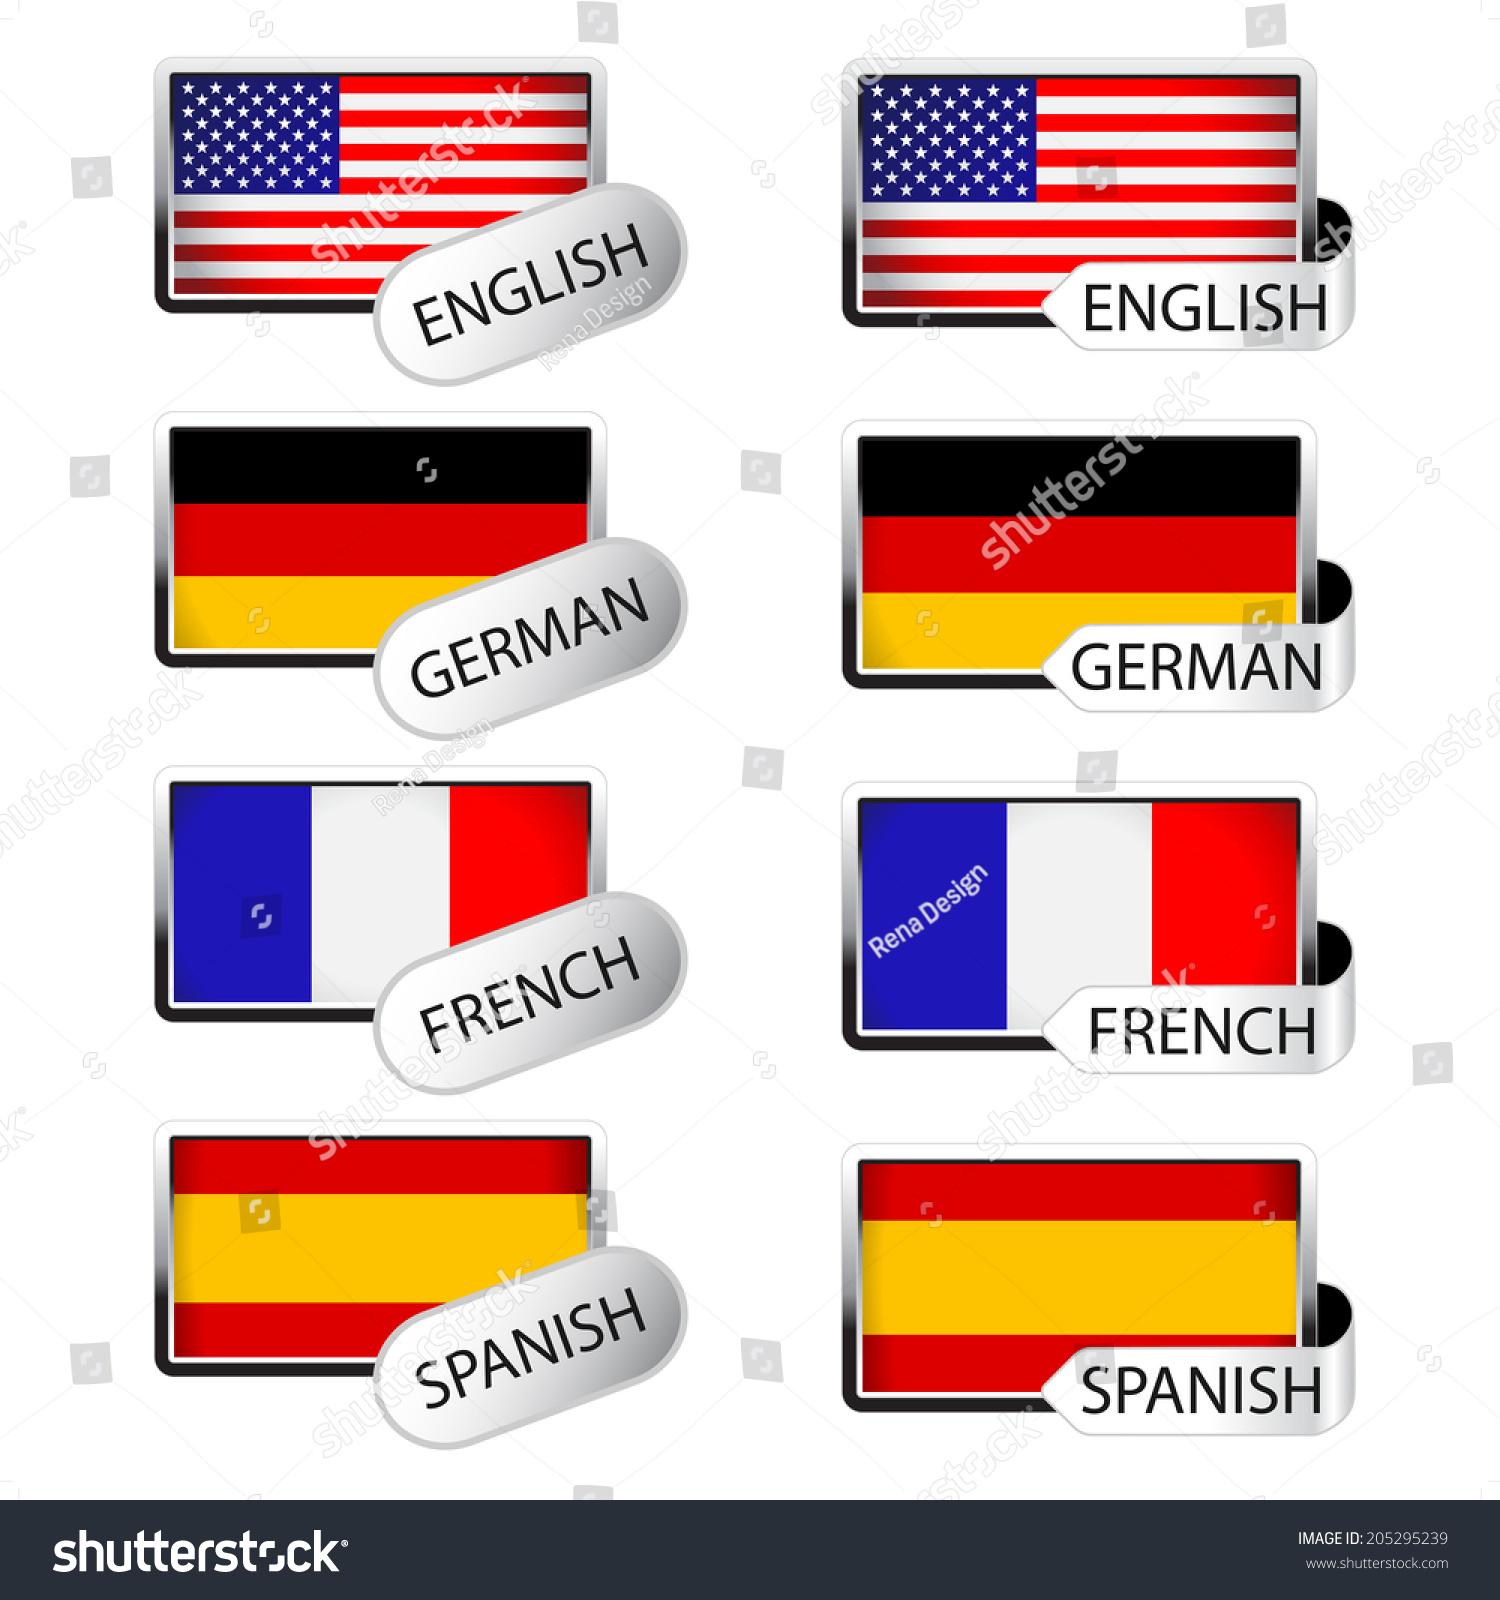 Spanish to english - Language Pointer For Web Flags English German French Spanish